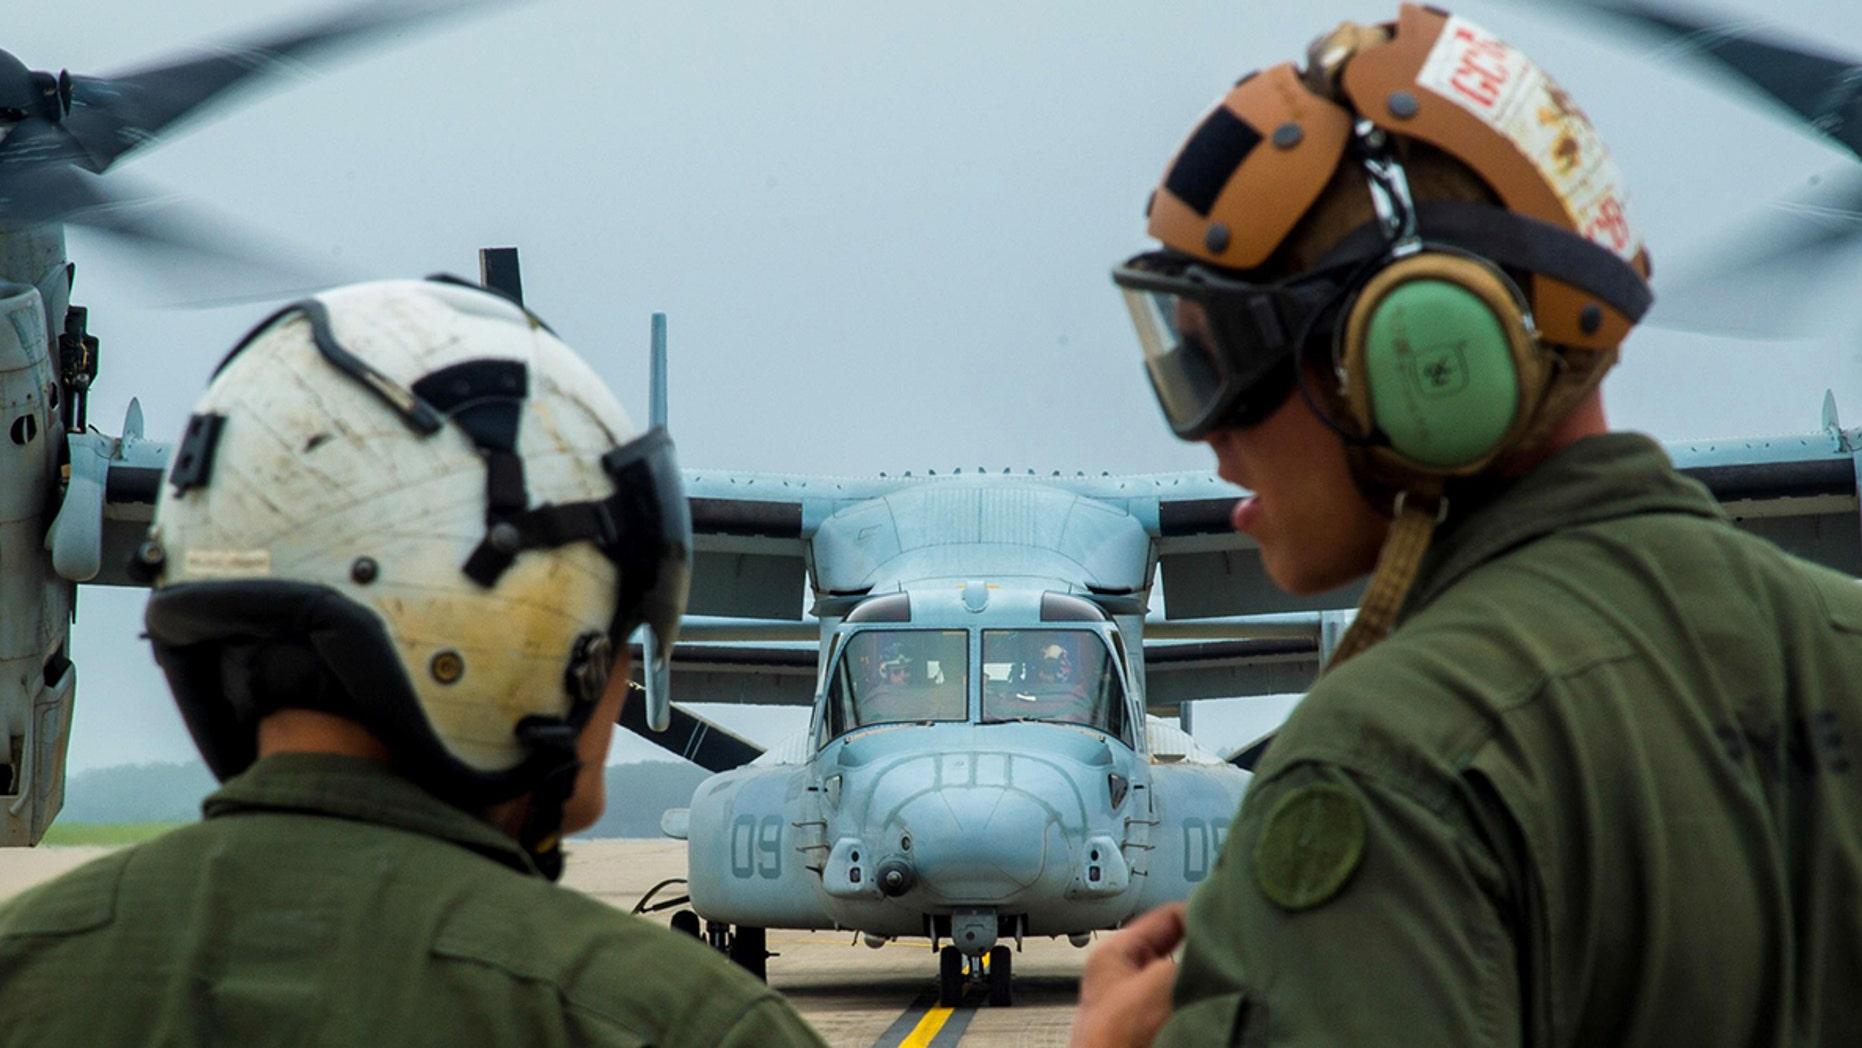 U.S. Marine Corps Cpl. Brandon Guico, a Marine Medium Tiltrotor Squadron 262 airframe aerial observer, and William Payne, a VMM-262 avionics technician, watch a MV-22 Osprey takeoff at Misawa Air Base, Japan last month.